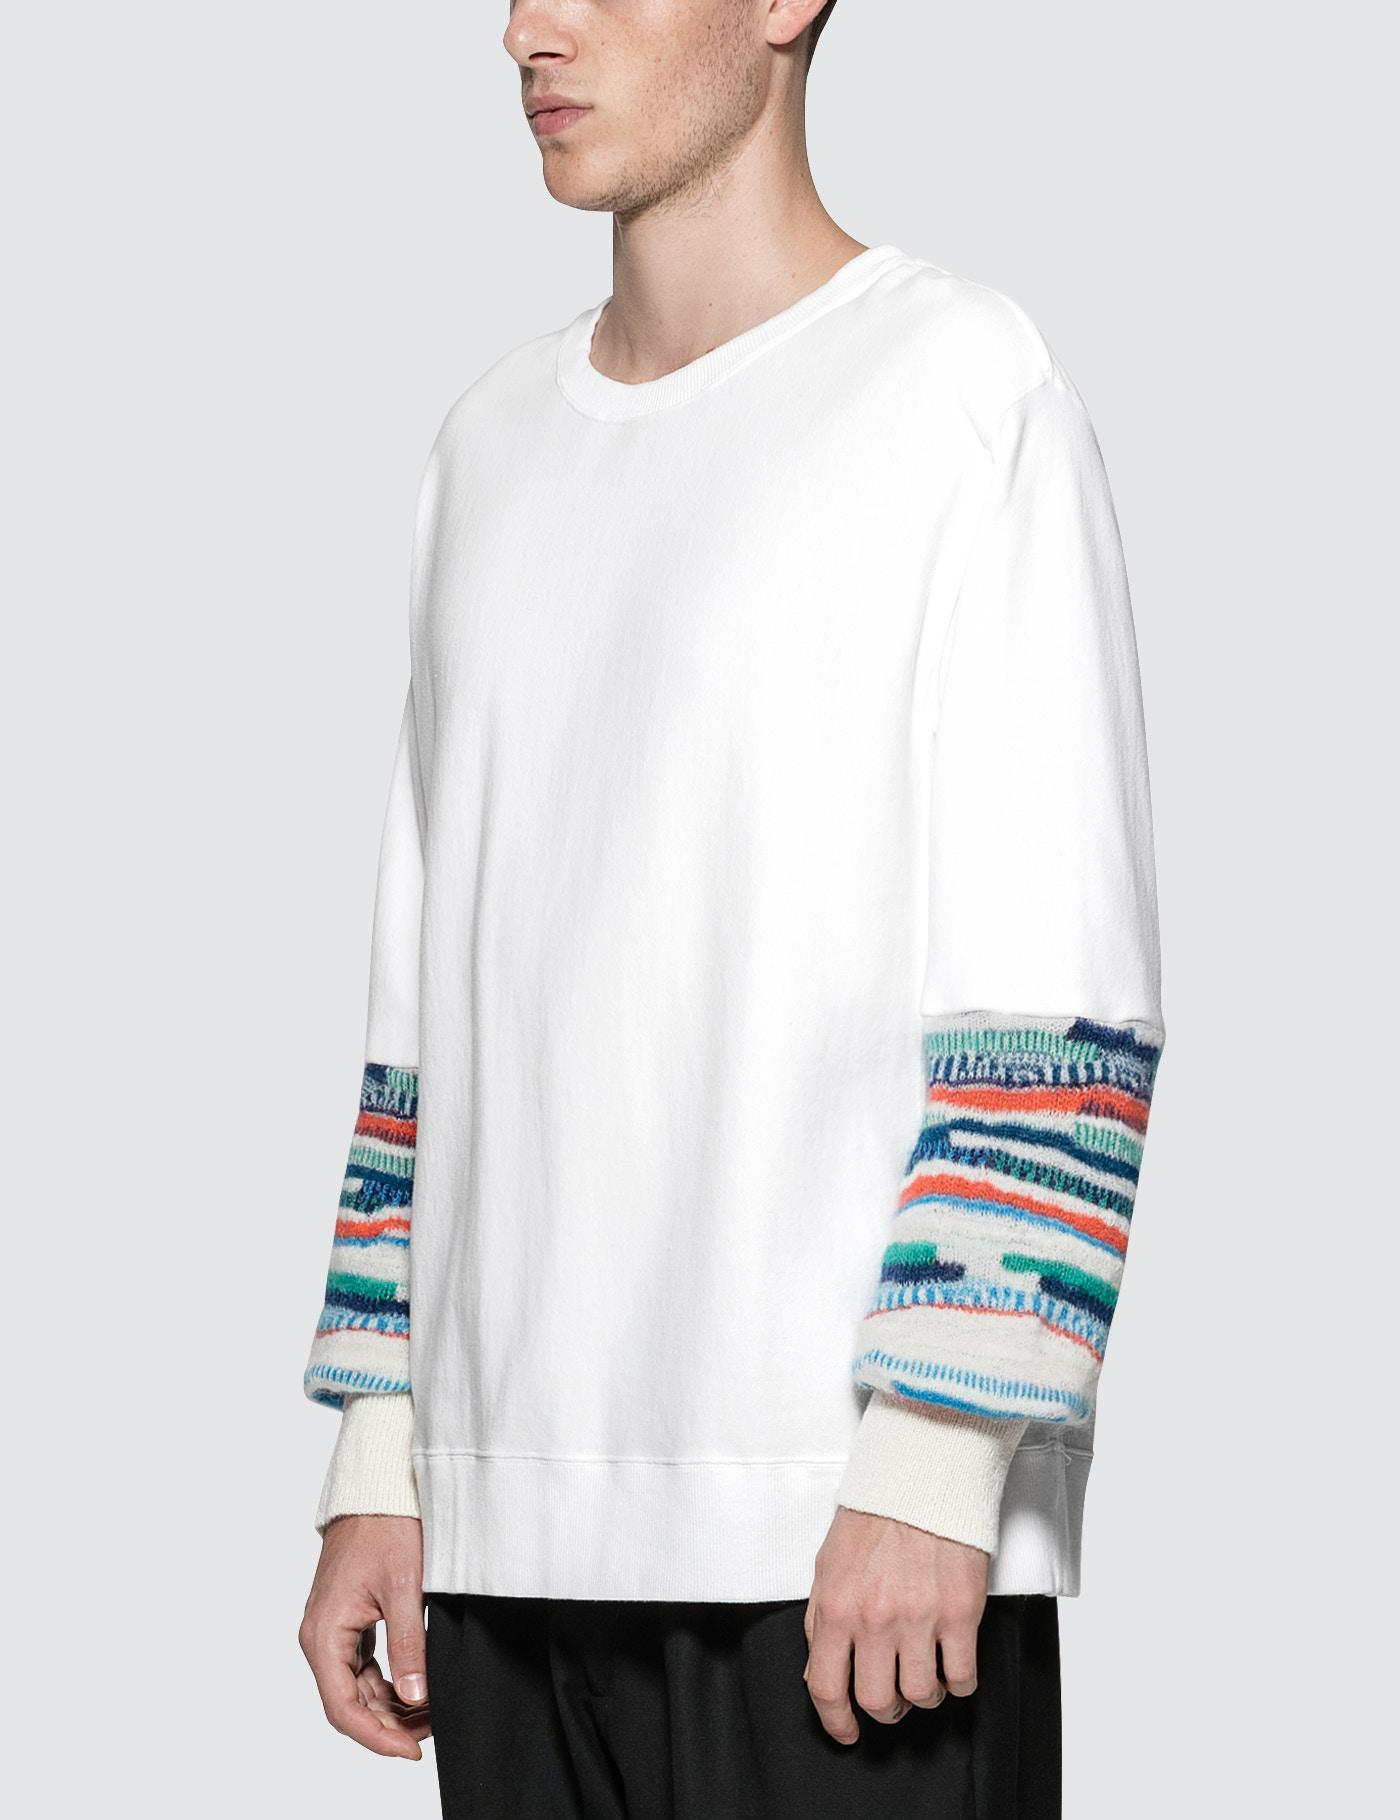 Facetasm Cotton Biggy Sweatshirt in White for Men